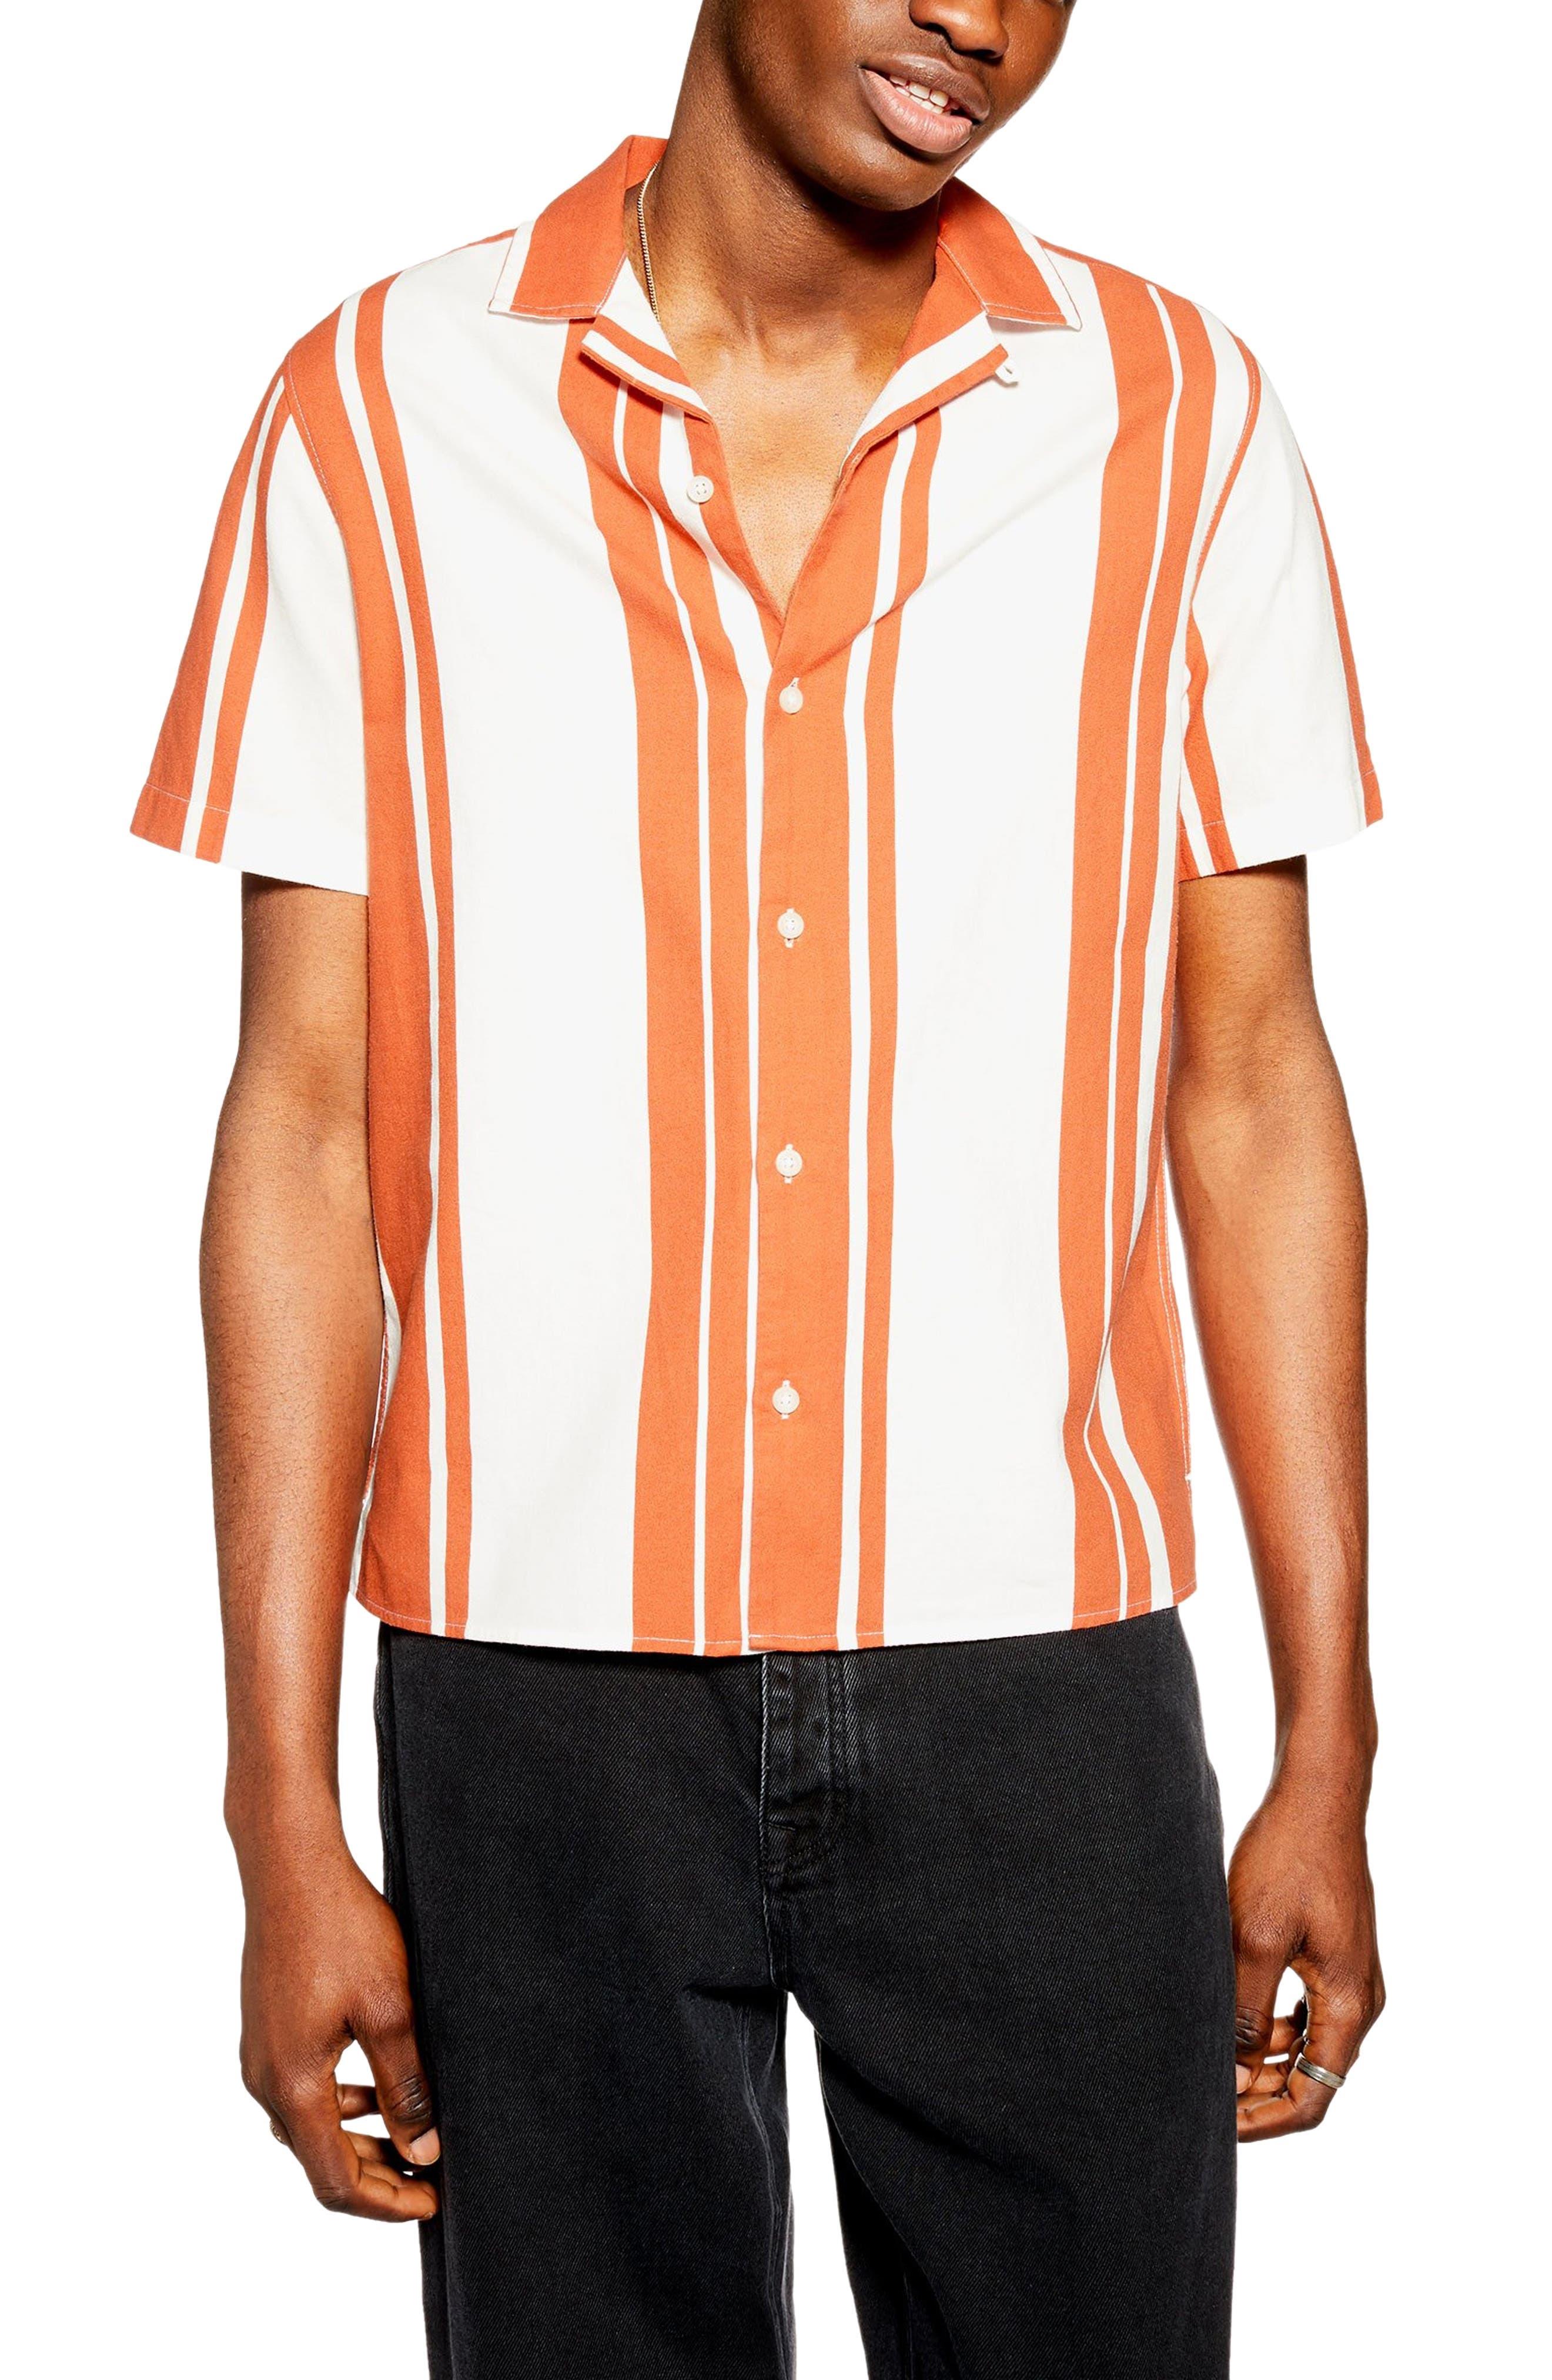 1960s – 70s Mens Shirts- Disco Shirts, Hippie Shirts Mens Topman Stripe Short Sleeve Button-Up Camp Shirt $45.00 AT vintagedancer.com